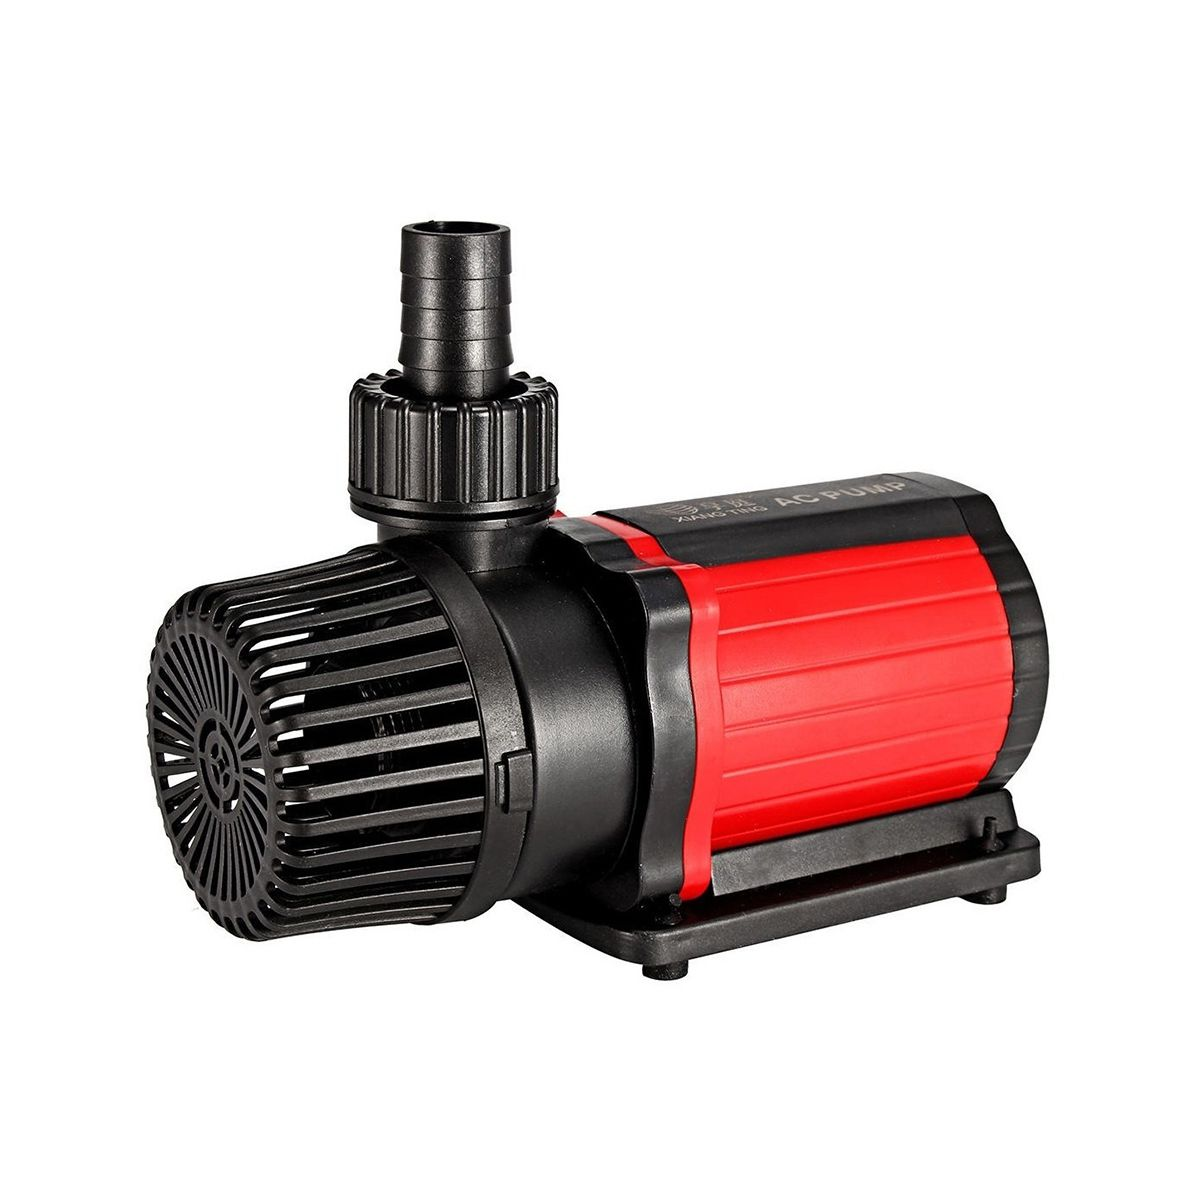 Bomba Ocean Tech AC-12000 Econômica 12000l/h 127v